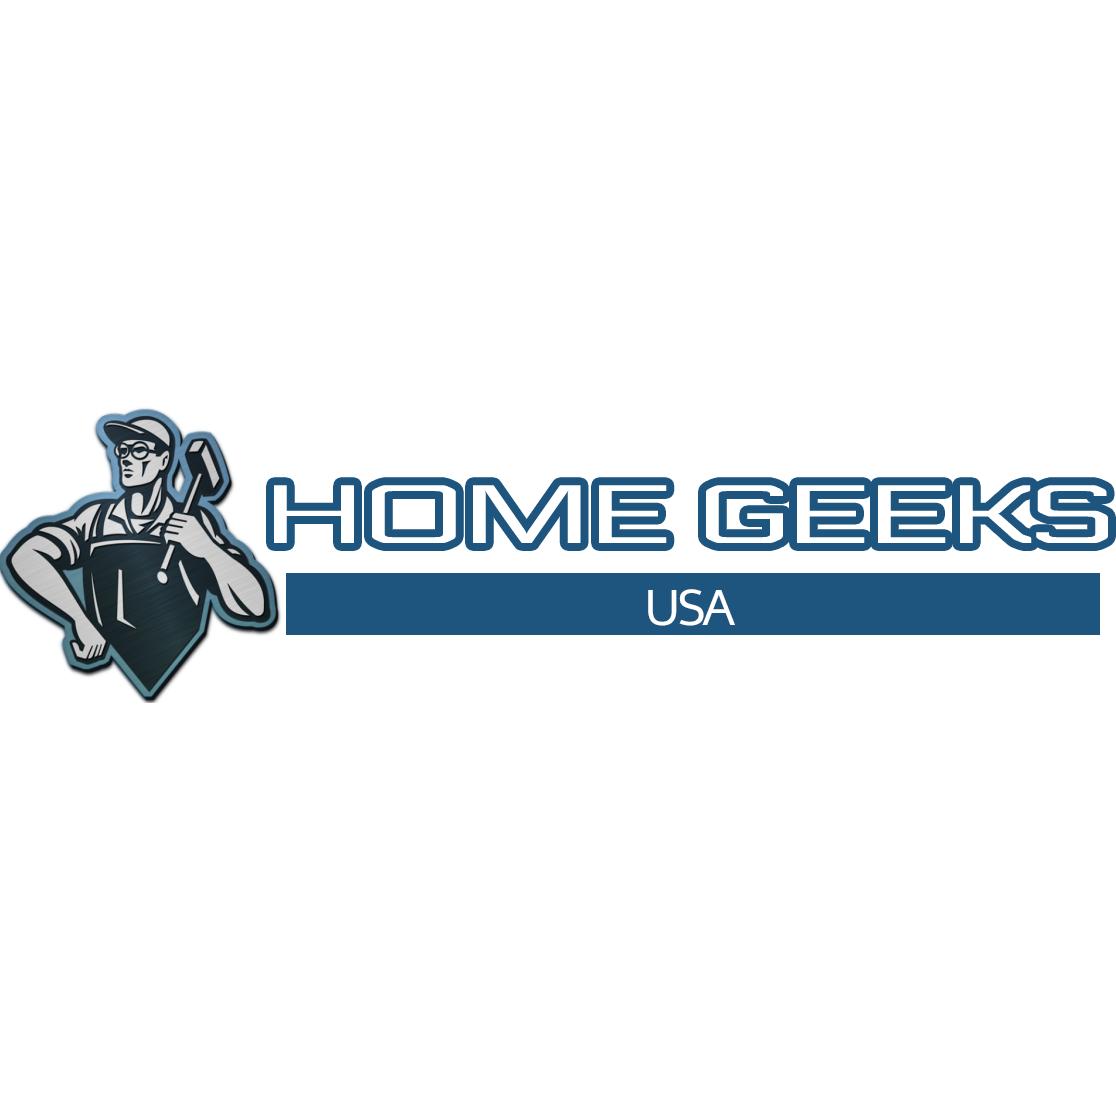 Home Geeks USA